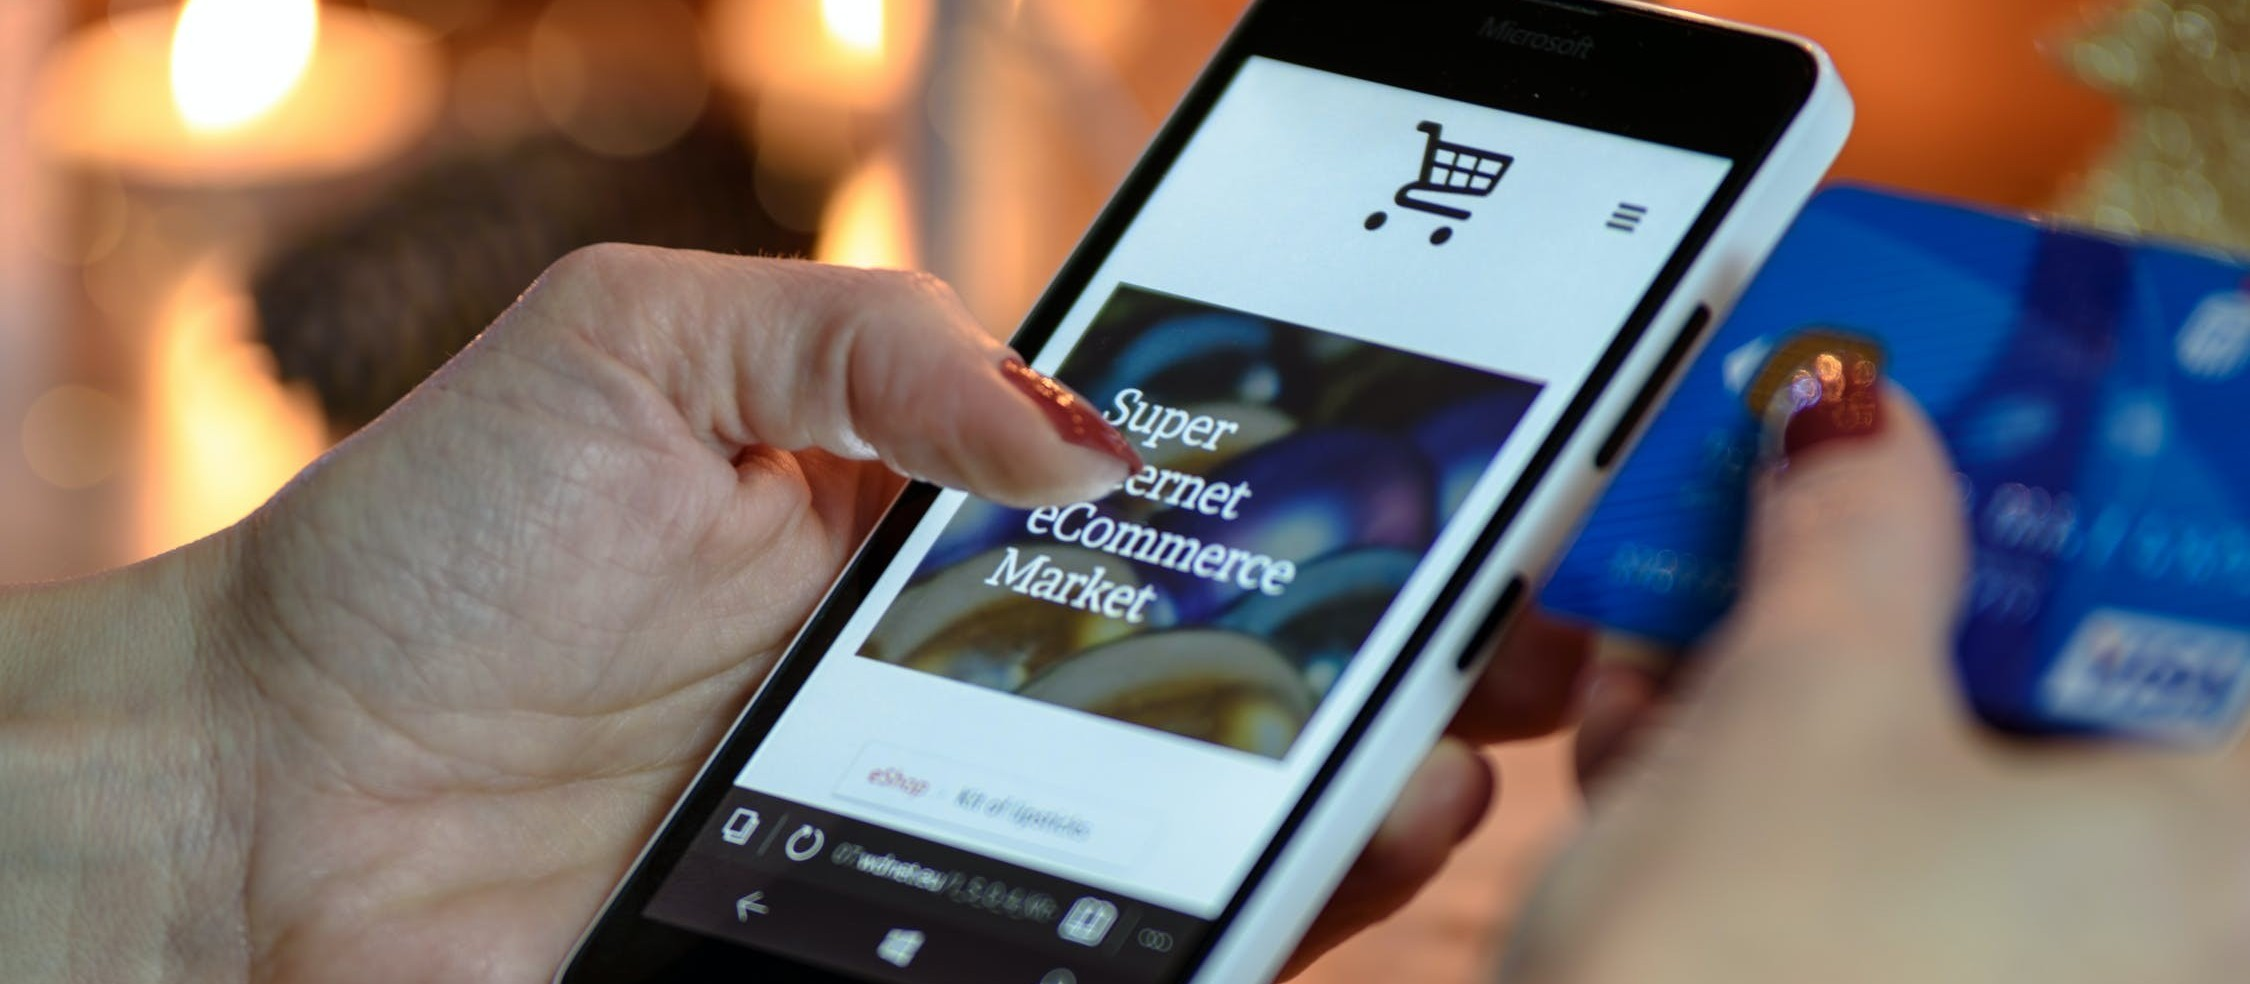 E-commerce cresce exponencialmente durante pandemia